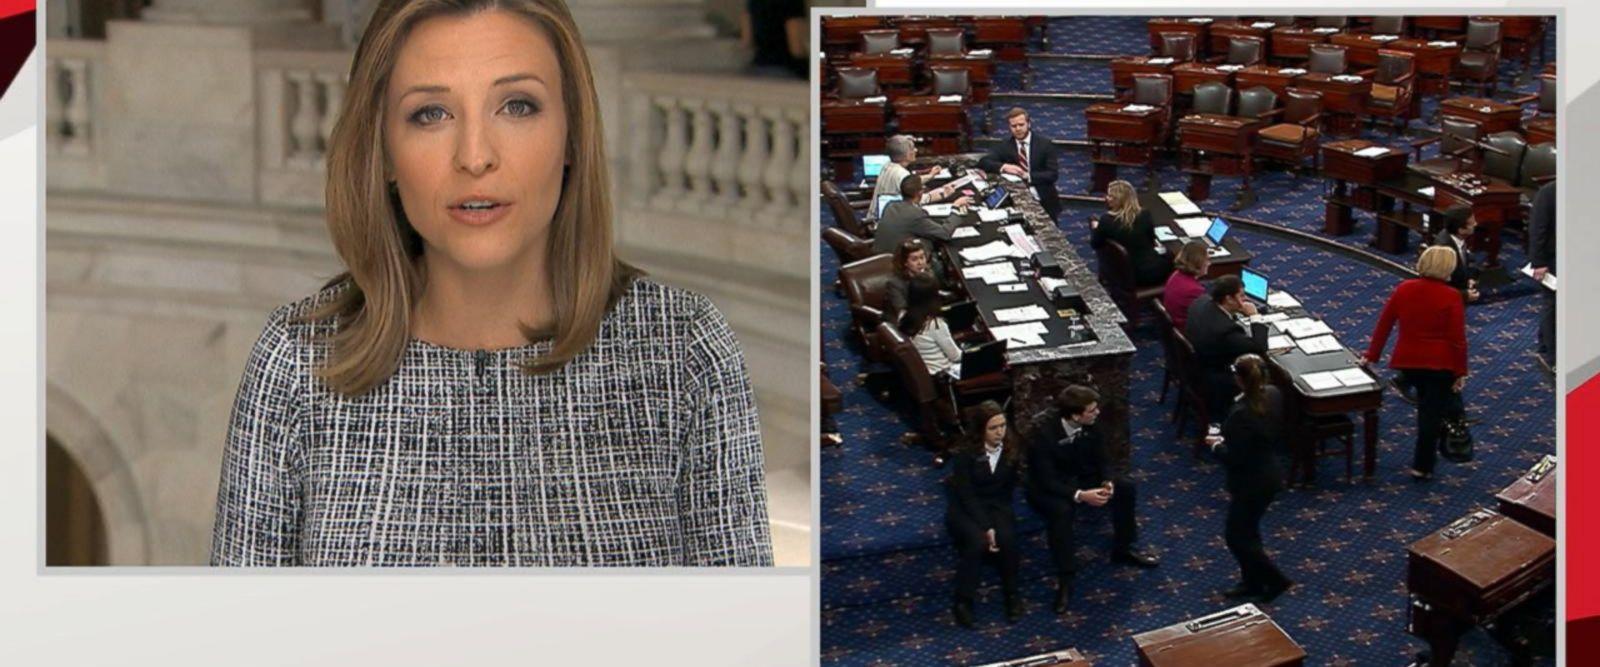 VIDEO: Senate votes to end debate, setting up vote to conclude shutdown